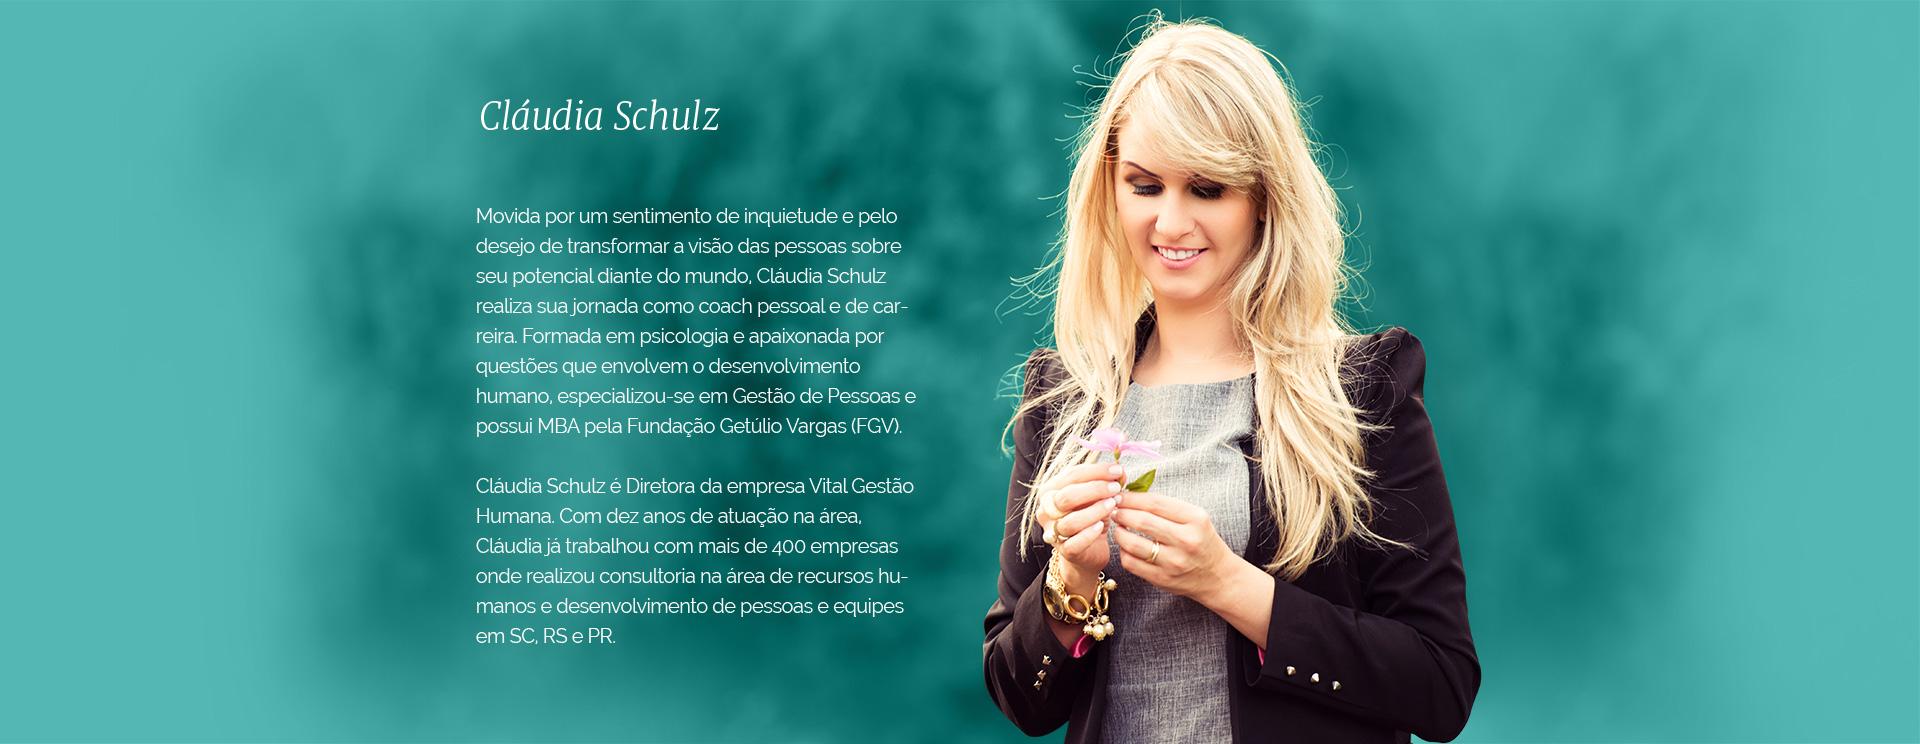 Cláudia Schulz